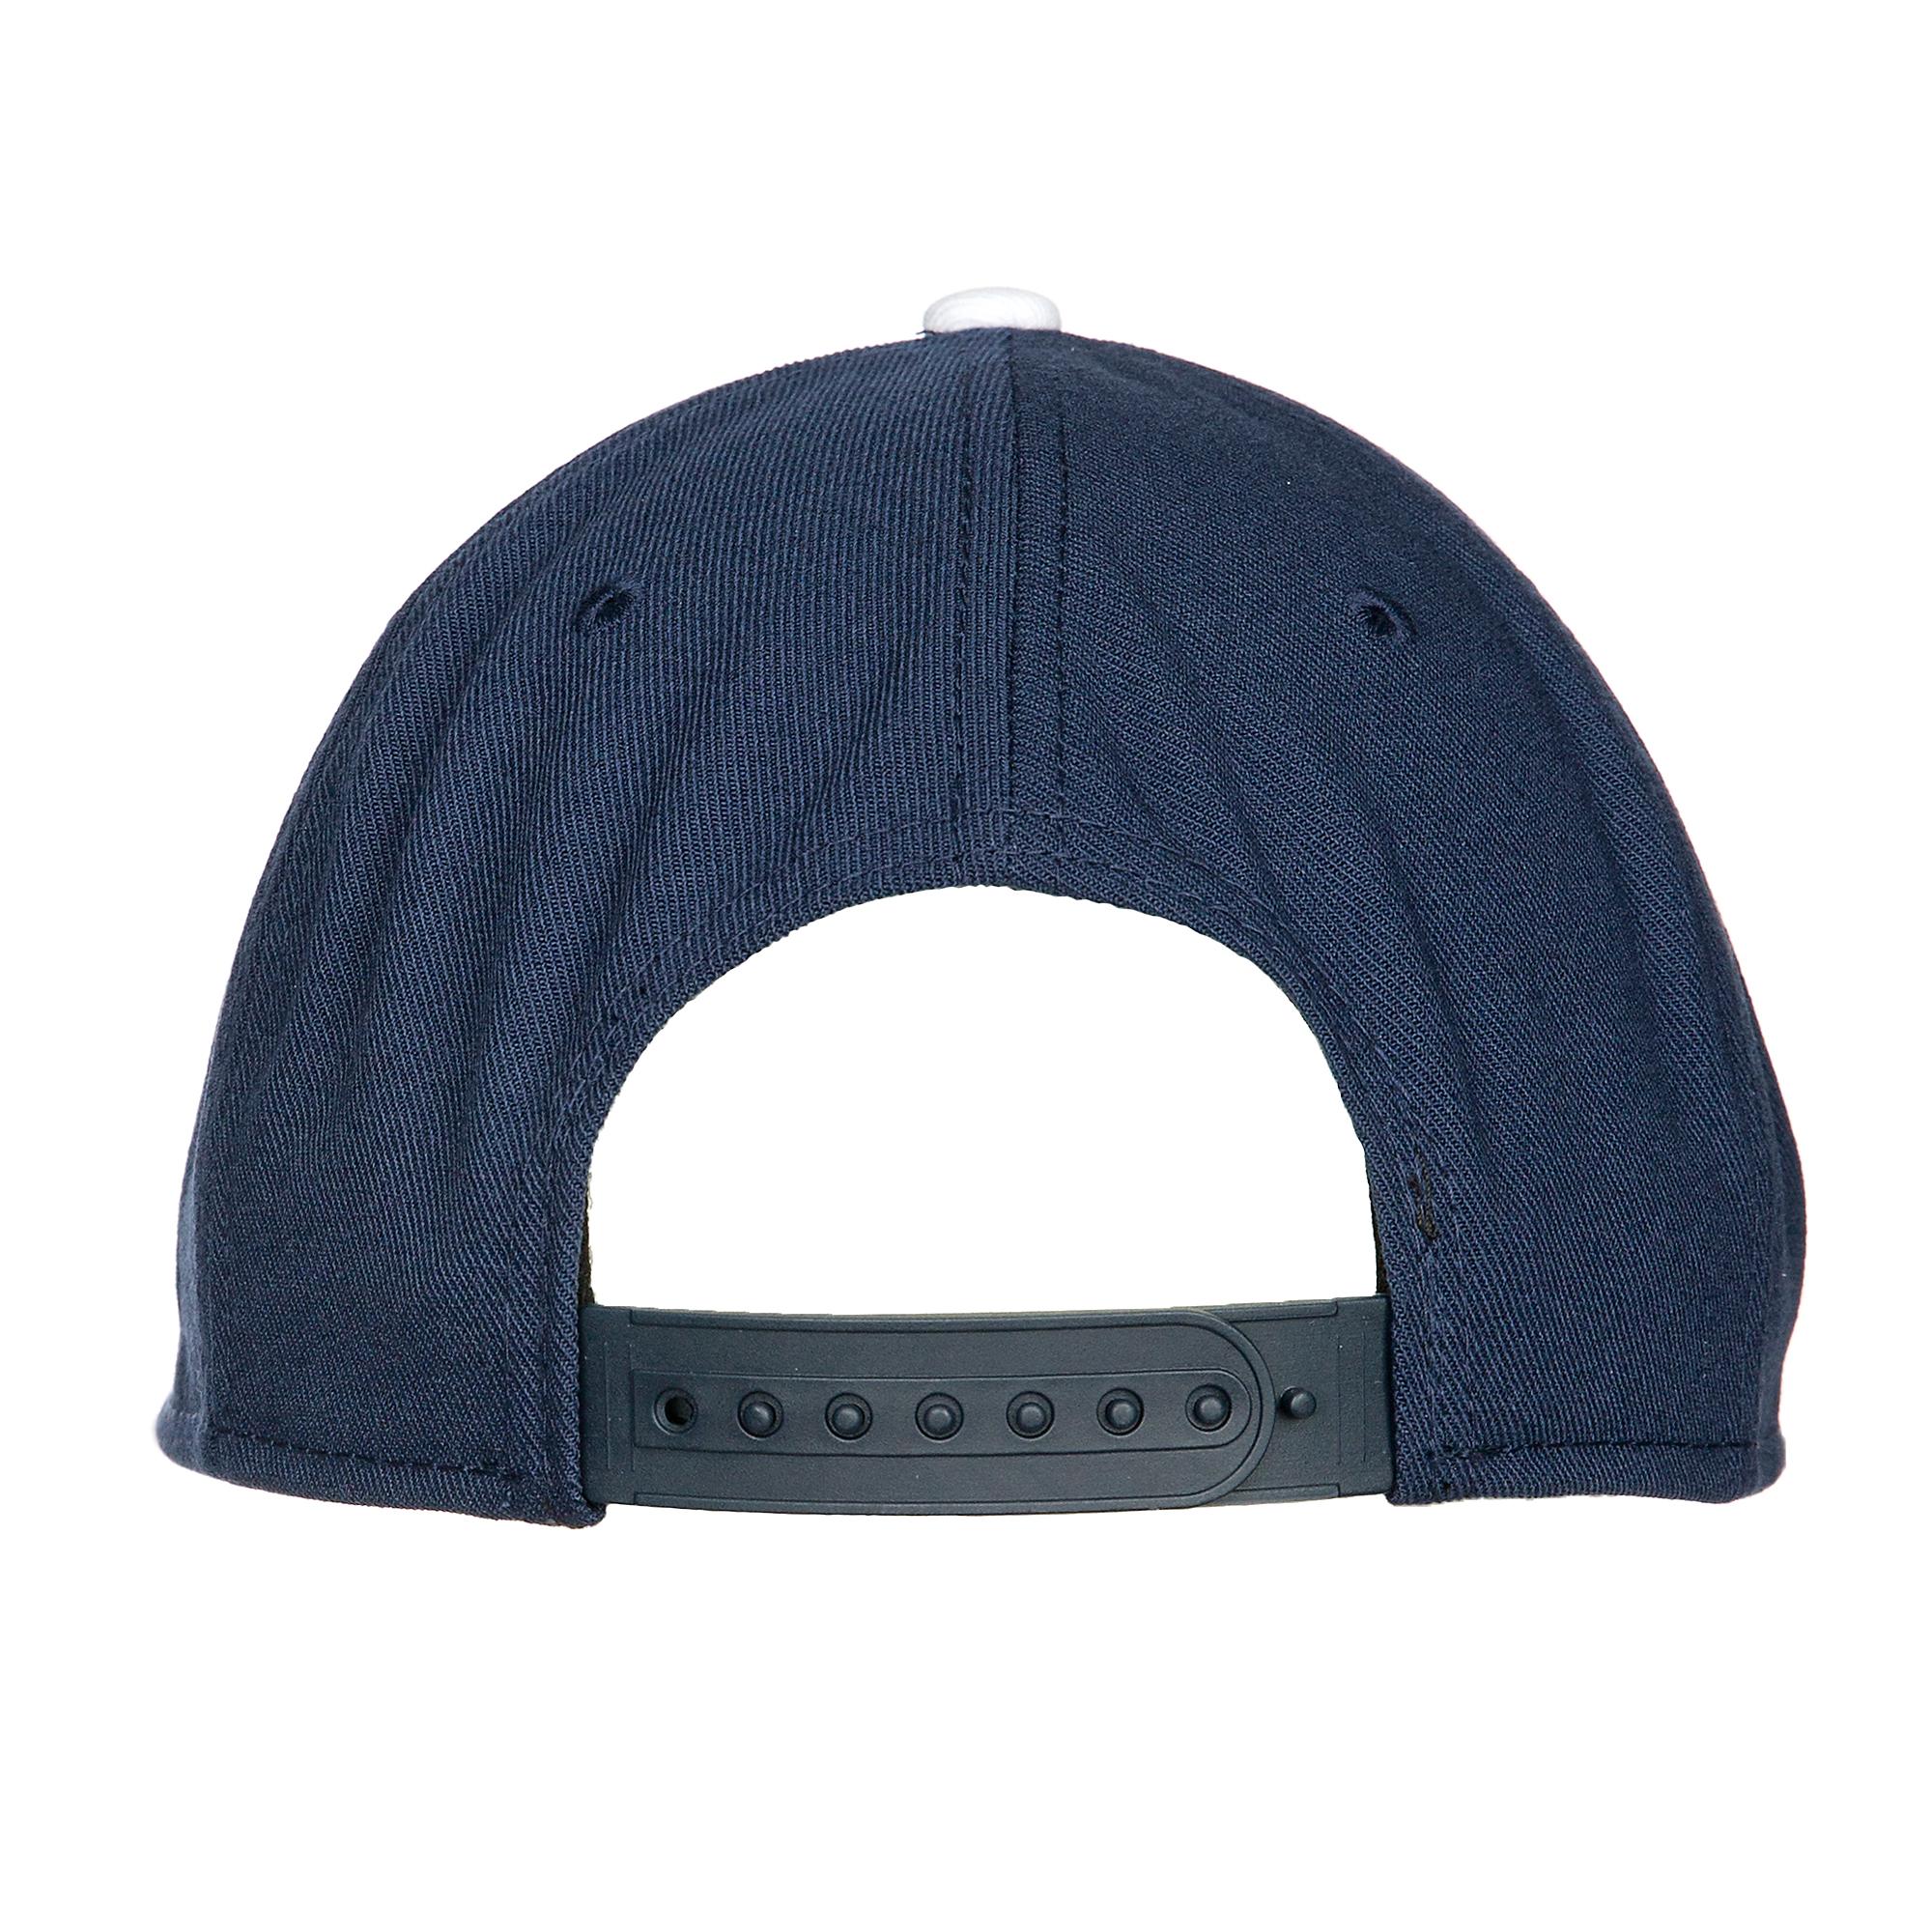 4c3819e8 Dallas Cowboys Nike True Snapback Cap | Fans United